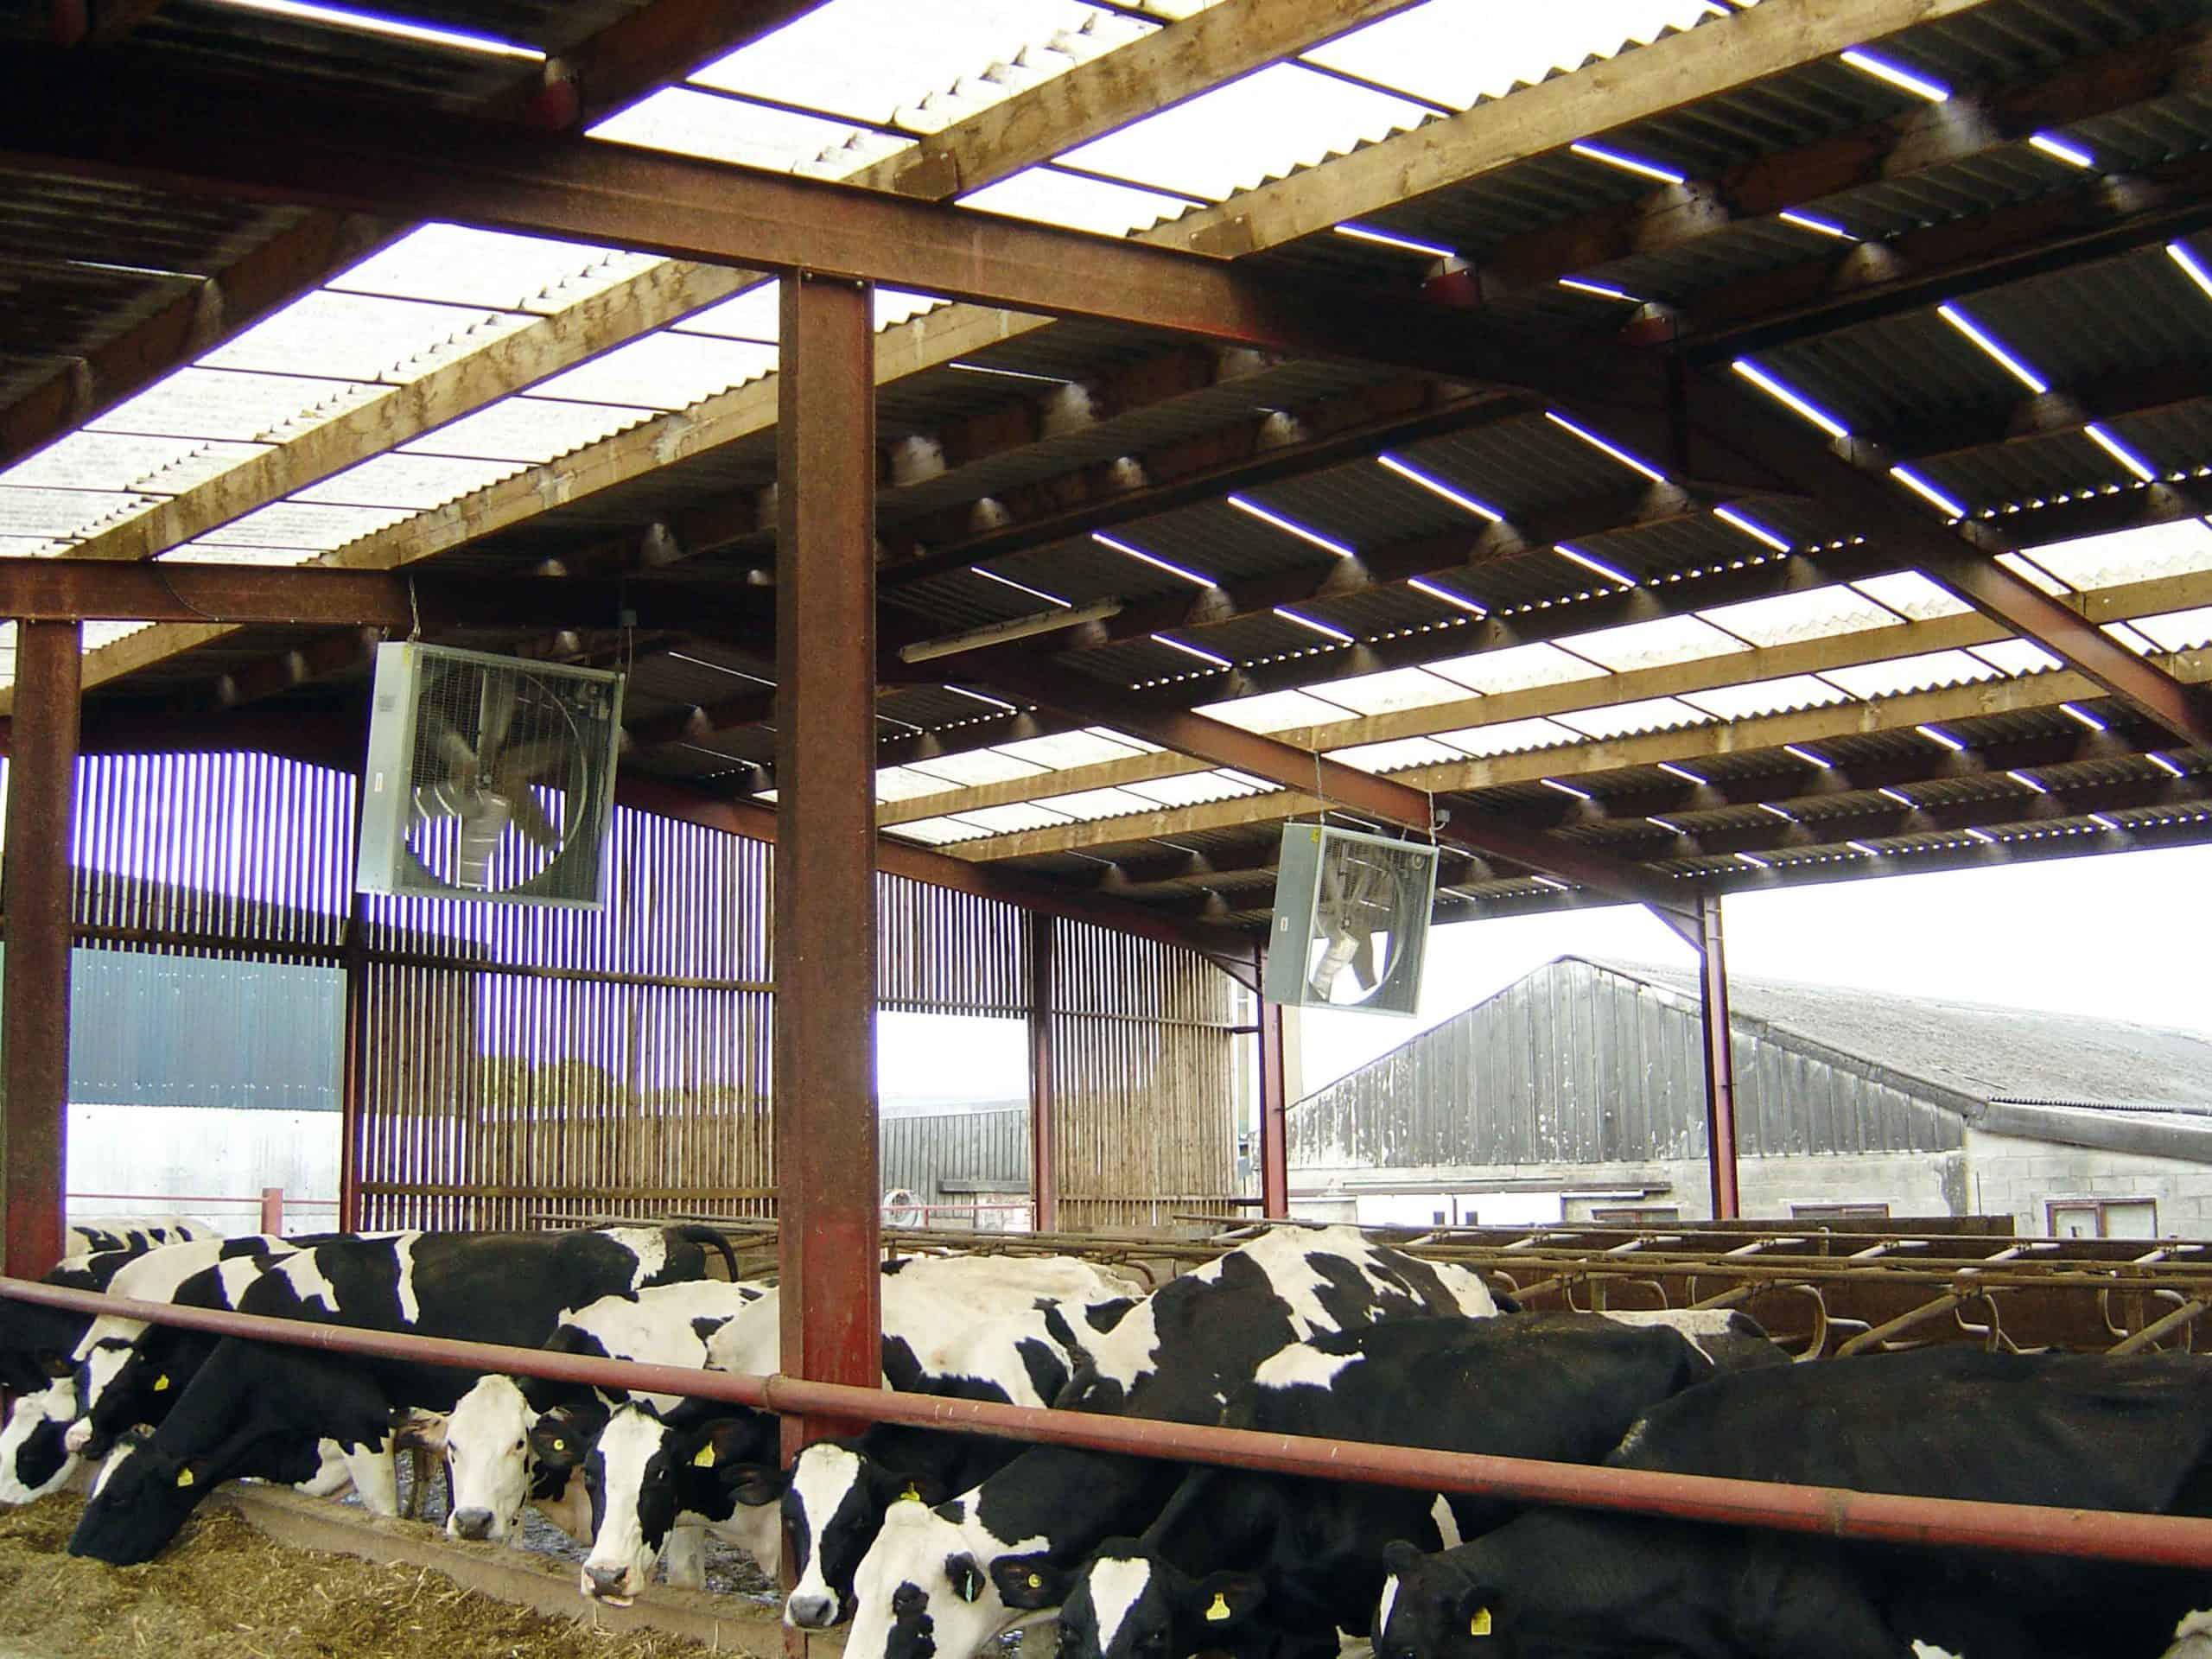 livestock building ventilation system helps reduce heat stress